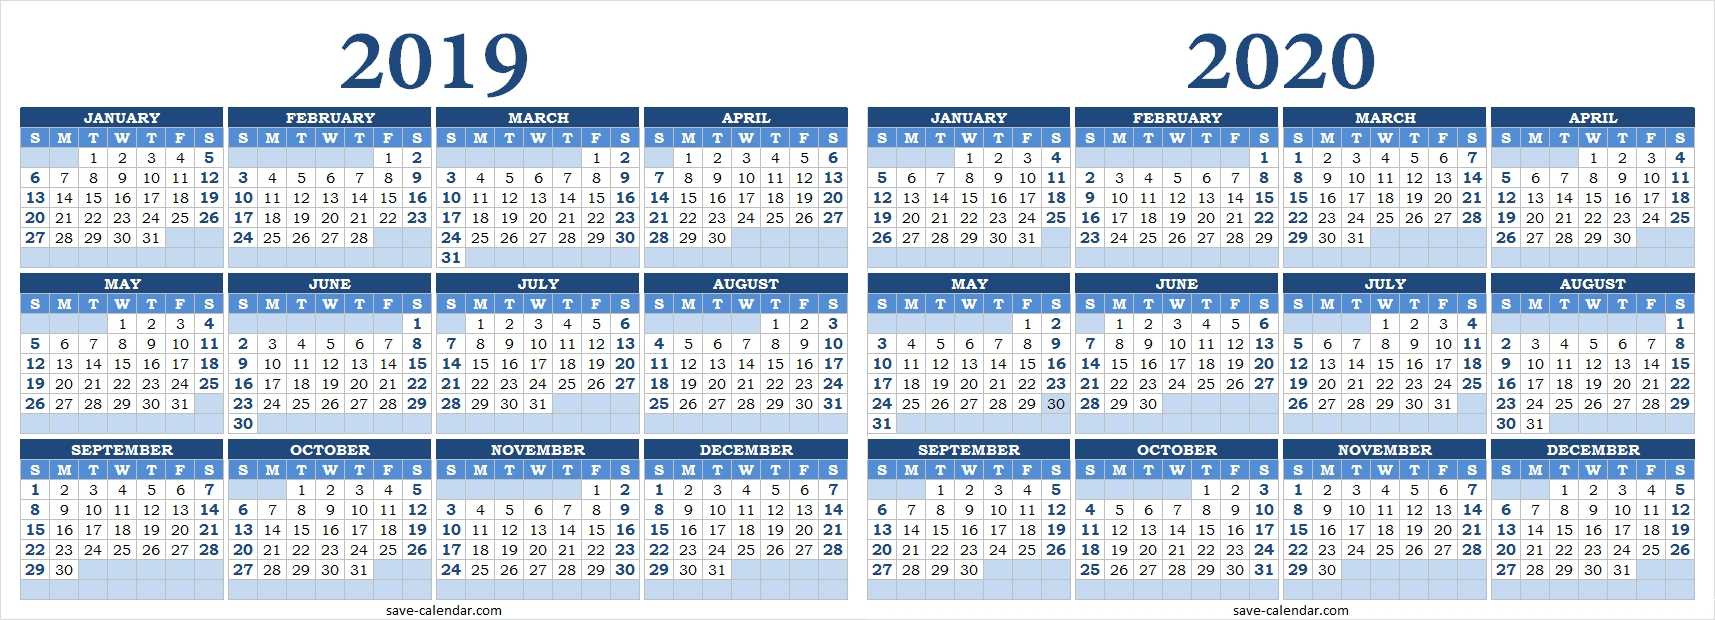 2019 2020 Calendar Blank | Templates Printable Free, 2020